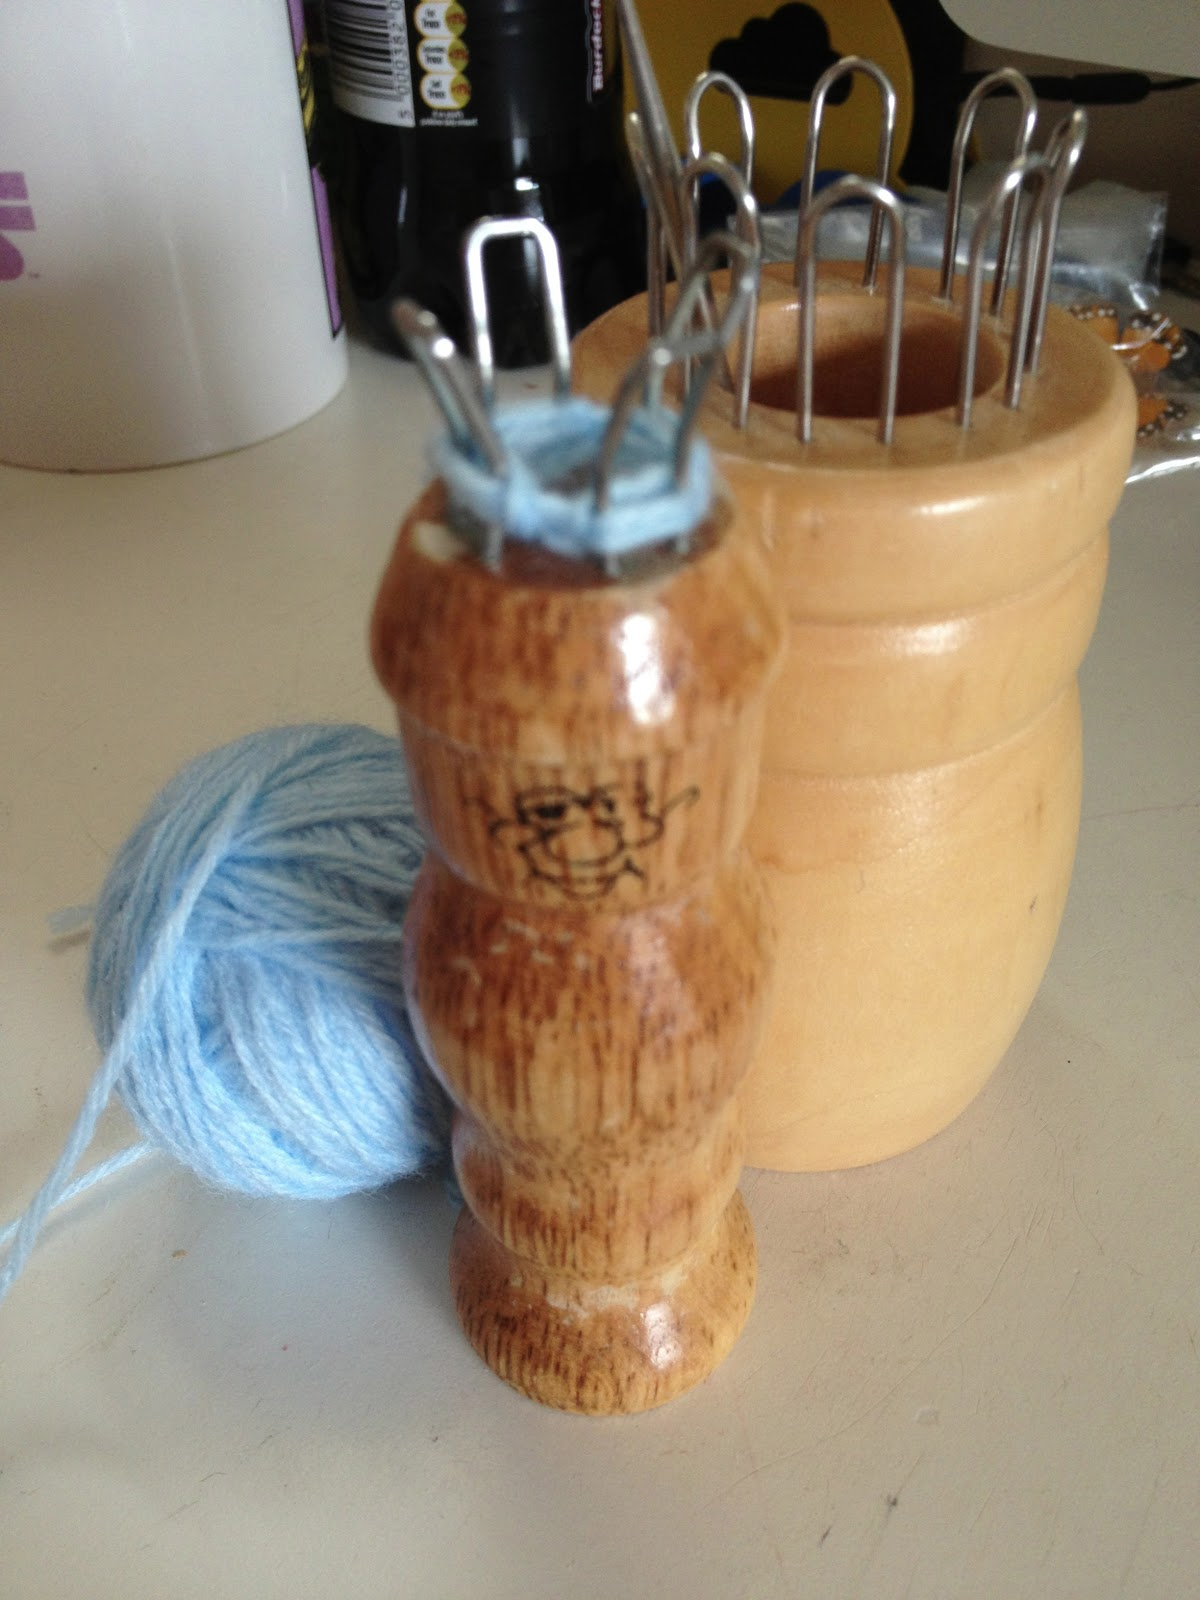 Knitting Nancy Machine : Craftyandcake knitting nancy and looms with a